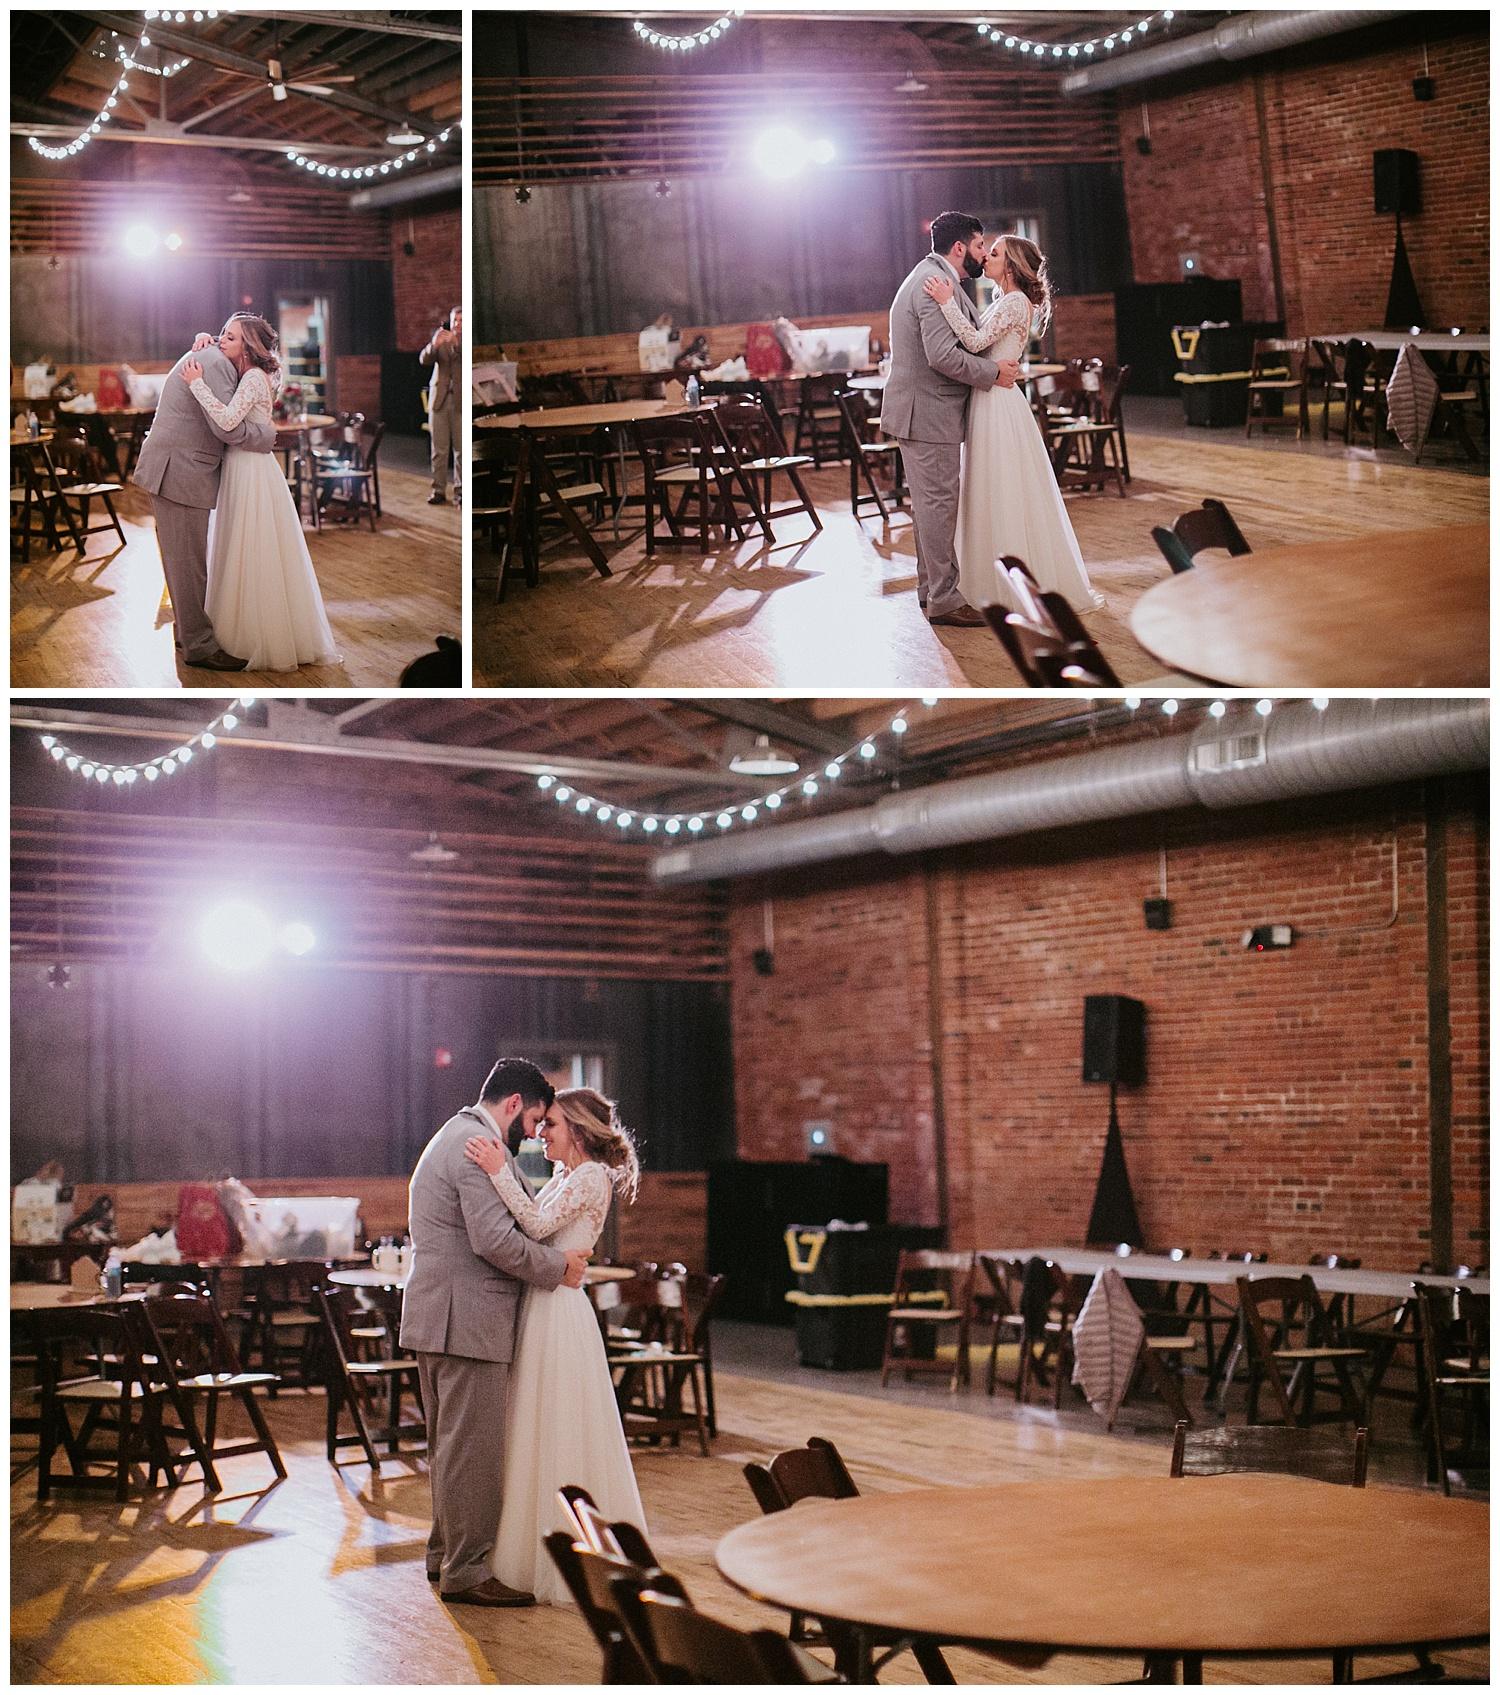 winter-wedding-the standard-knoxville_2019-01-23_0101.jpg